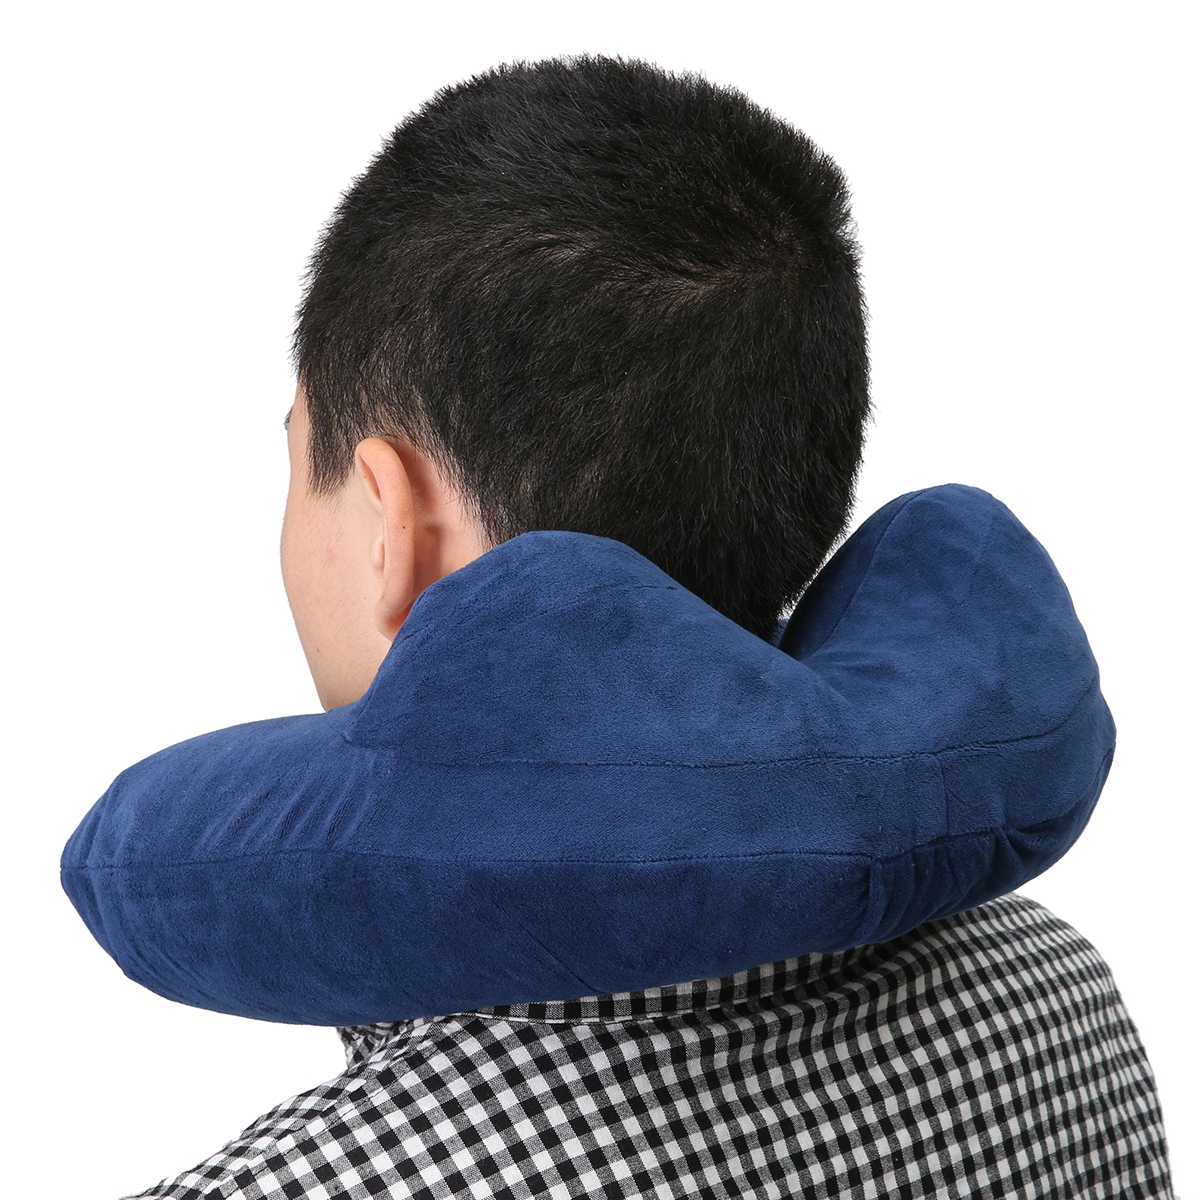 CAMTOA U Shaped Travel Pillow Car Air Flight Inflatable Pillows Neck Support Headrest Cushion Soft Nursing Cushion